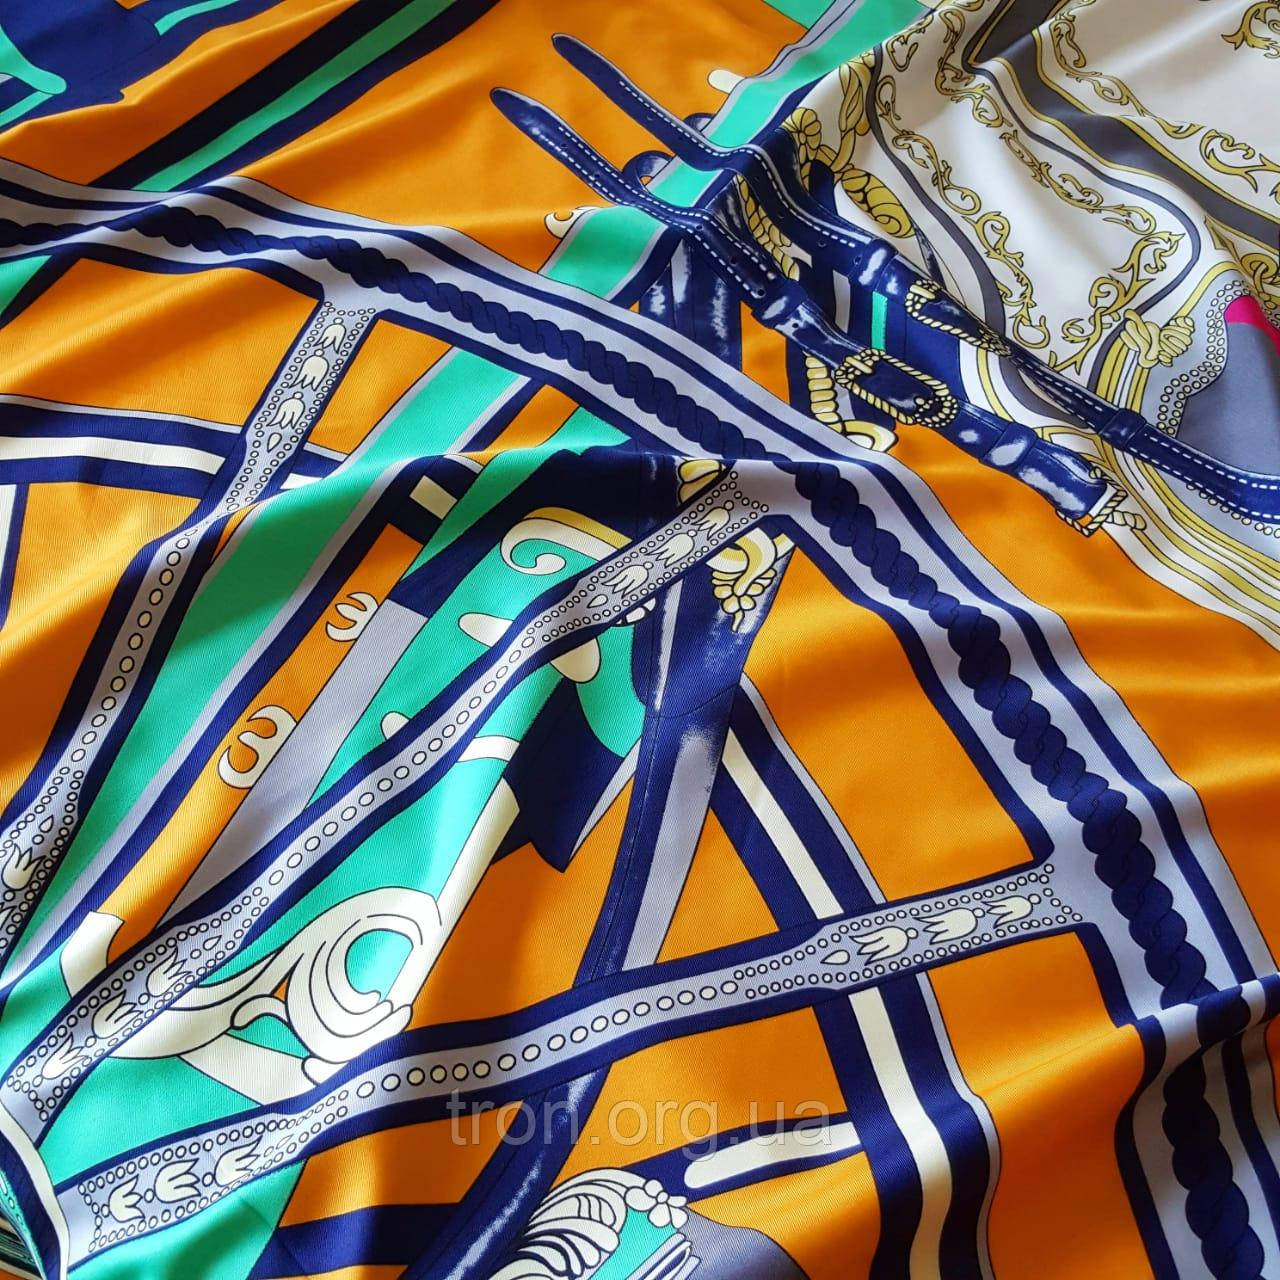 платок гермес цена